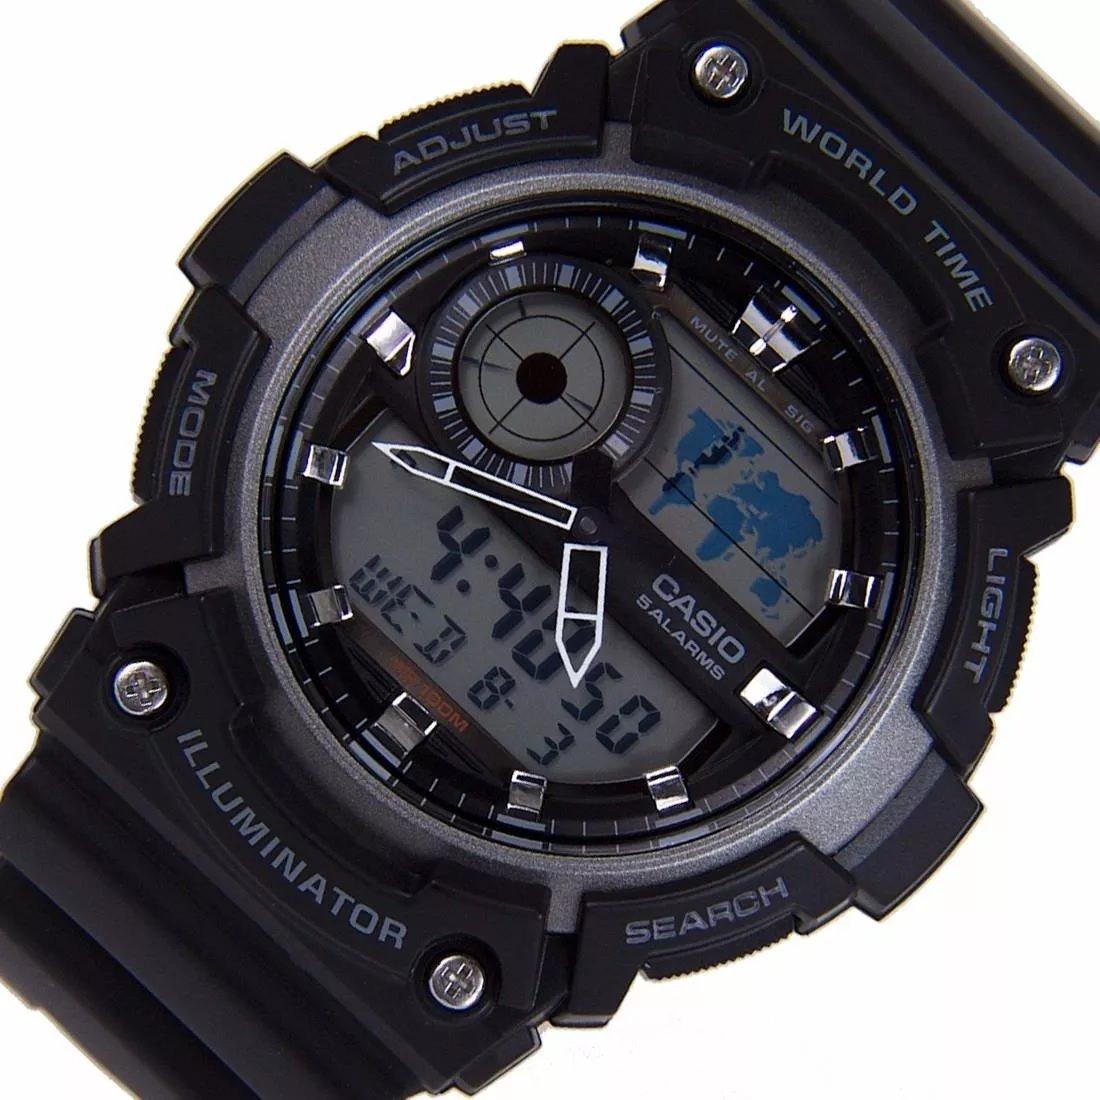 999bcf7bc71 Relogio Casio Aeq-200w-1 5alarm Crono Timer Hora Mundi Wr100 - R ...